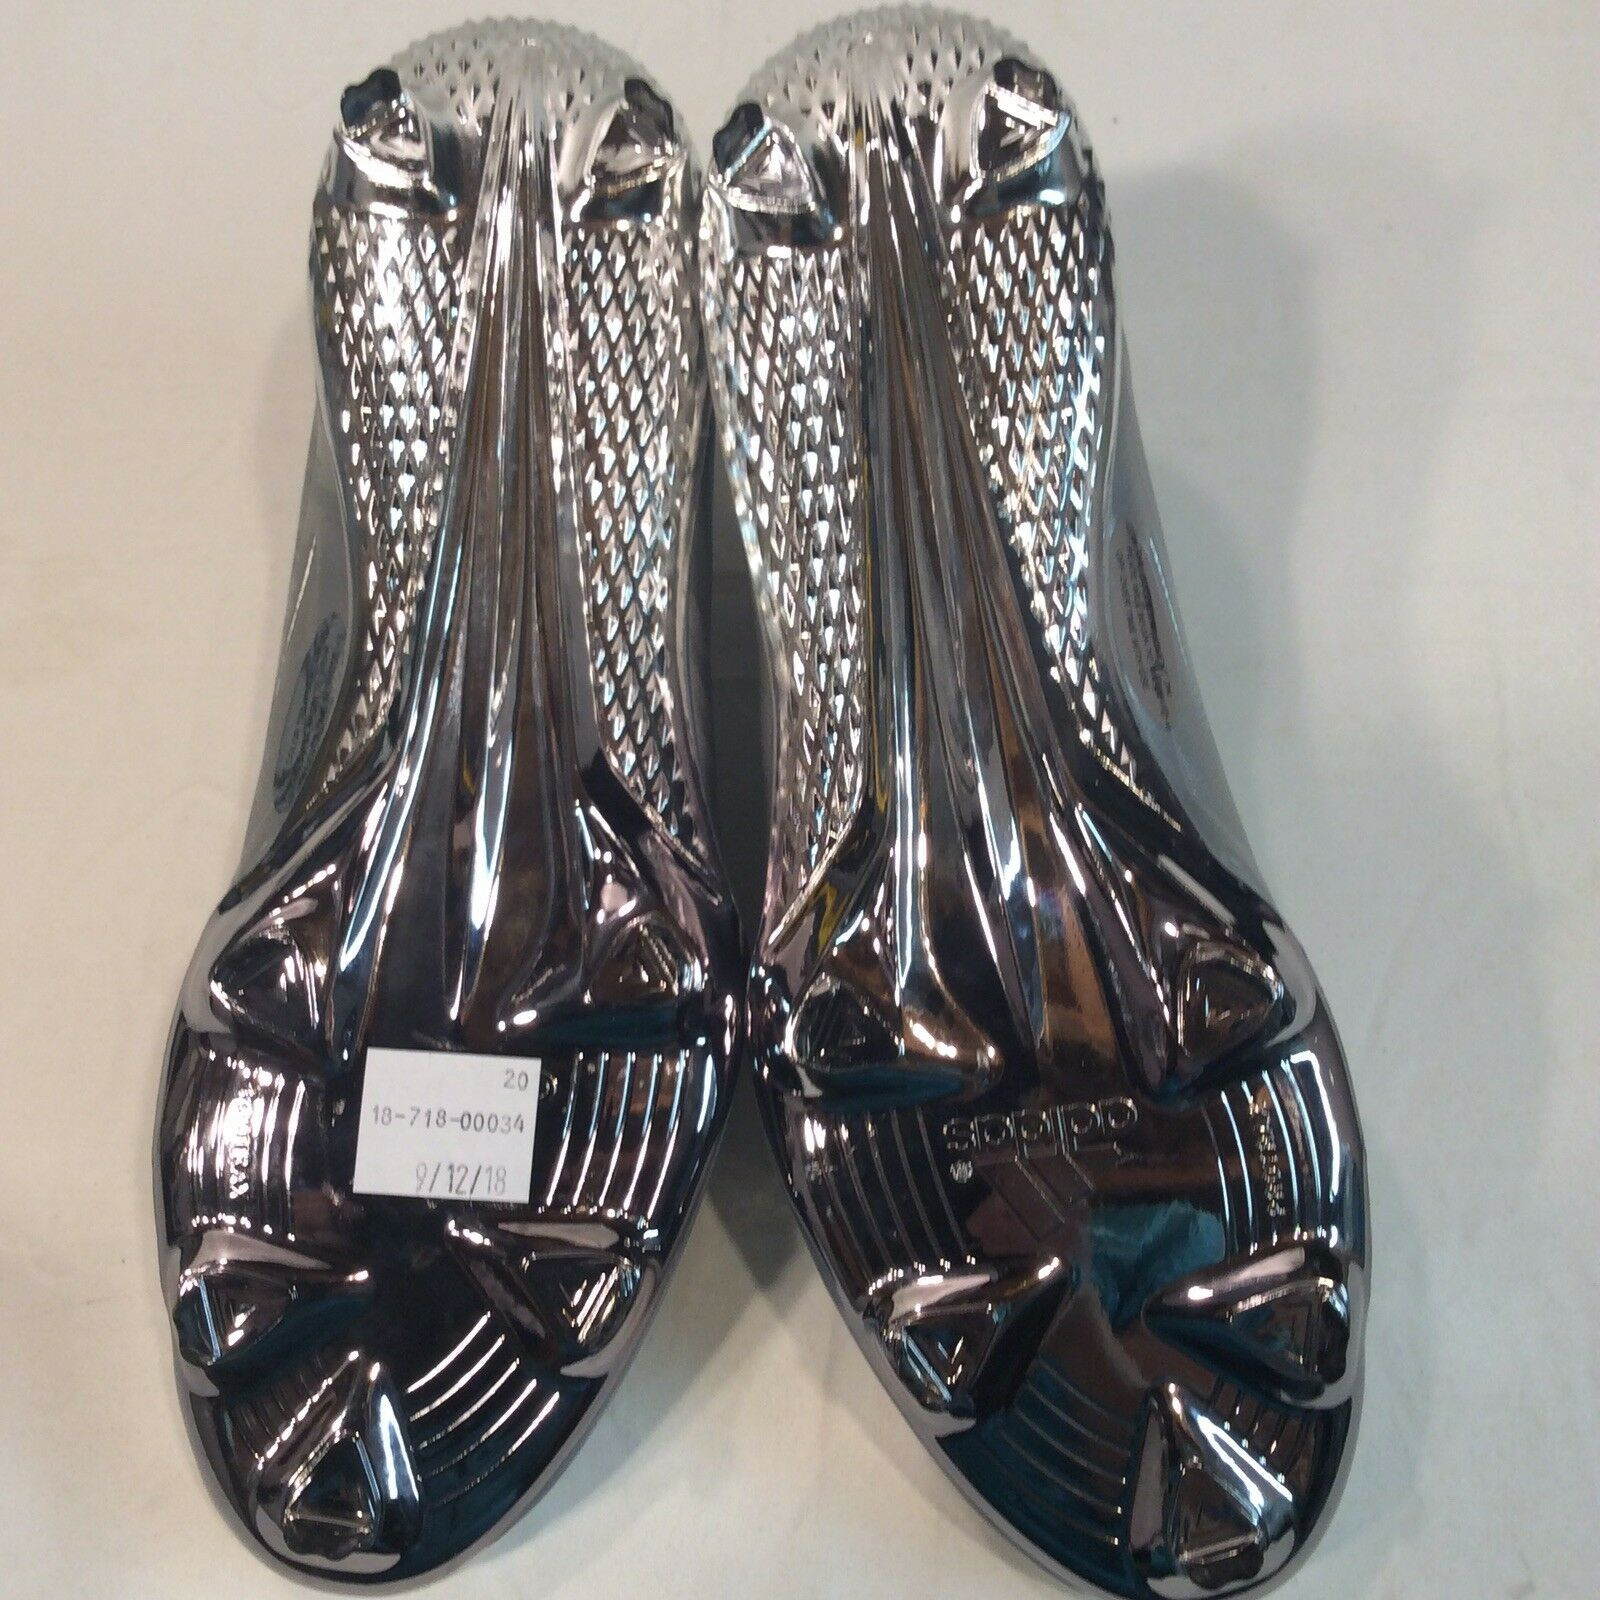 Adidas Adiizero Afterburner IV Silver Chrome 11.5 Baseball Cleat $120 CLEARANCE